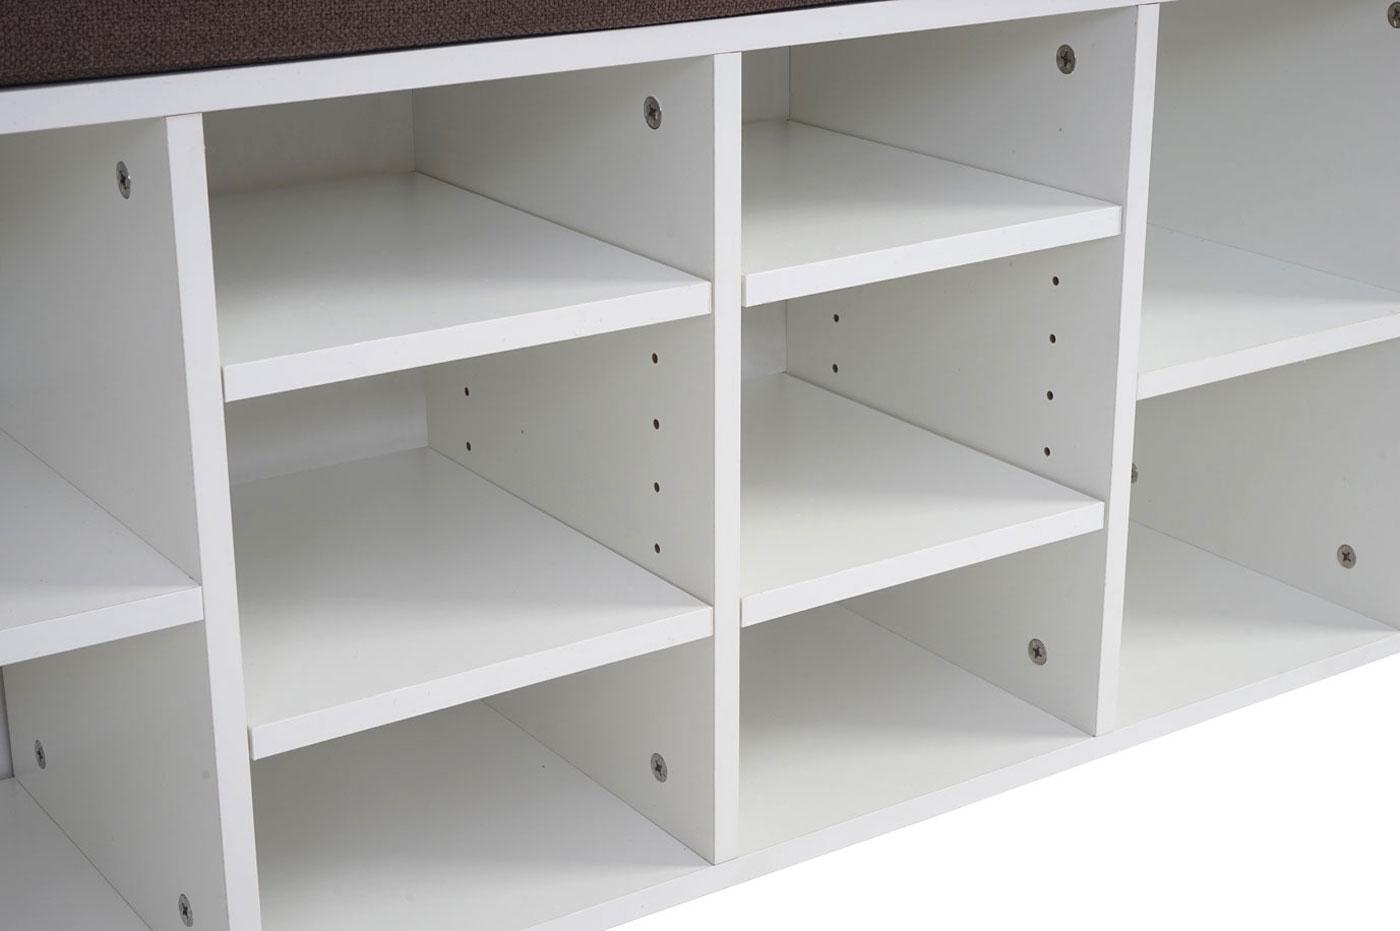 sitzbank brisbane schuhschrank regal sitzkissen 49x104x29cm. Black Bedroom Furniture Sets. Home Design Ideas